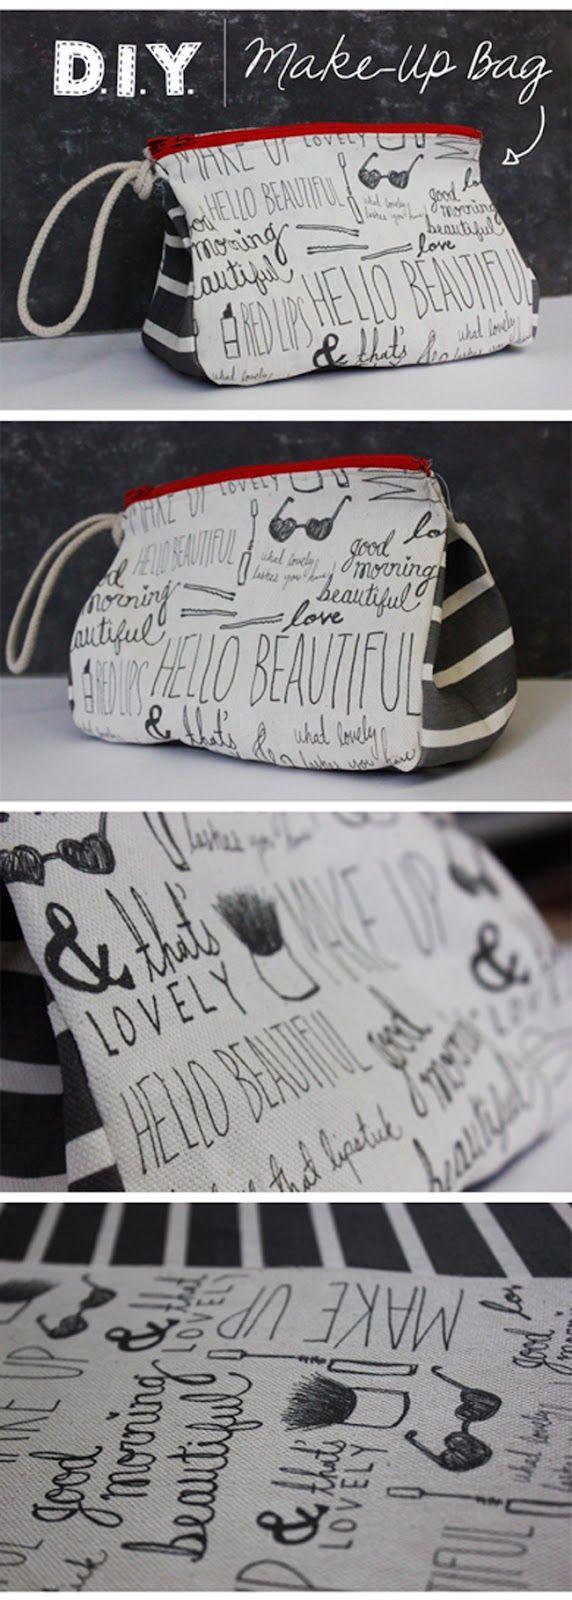 how to print on canvas/fabric + diy make up bag // tutorial imprimir en tela y patrón bolsa maquillaje